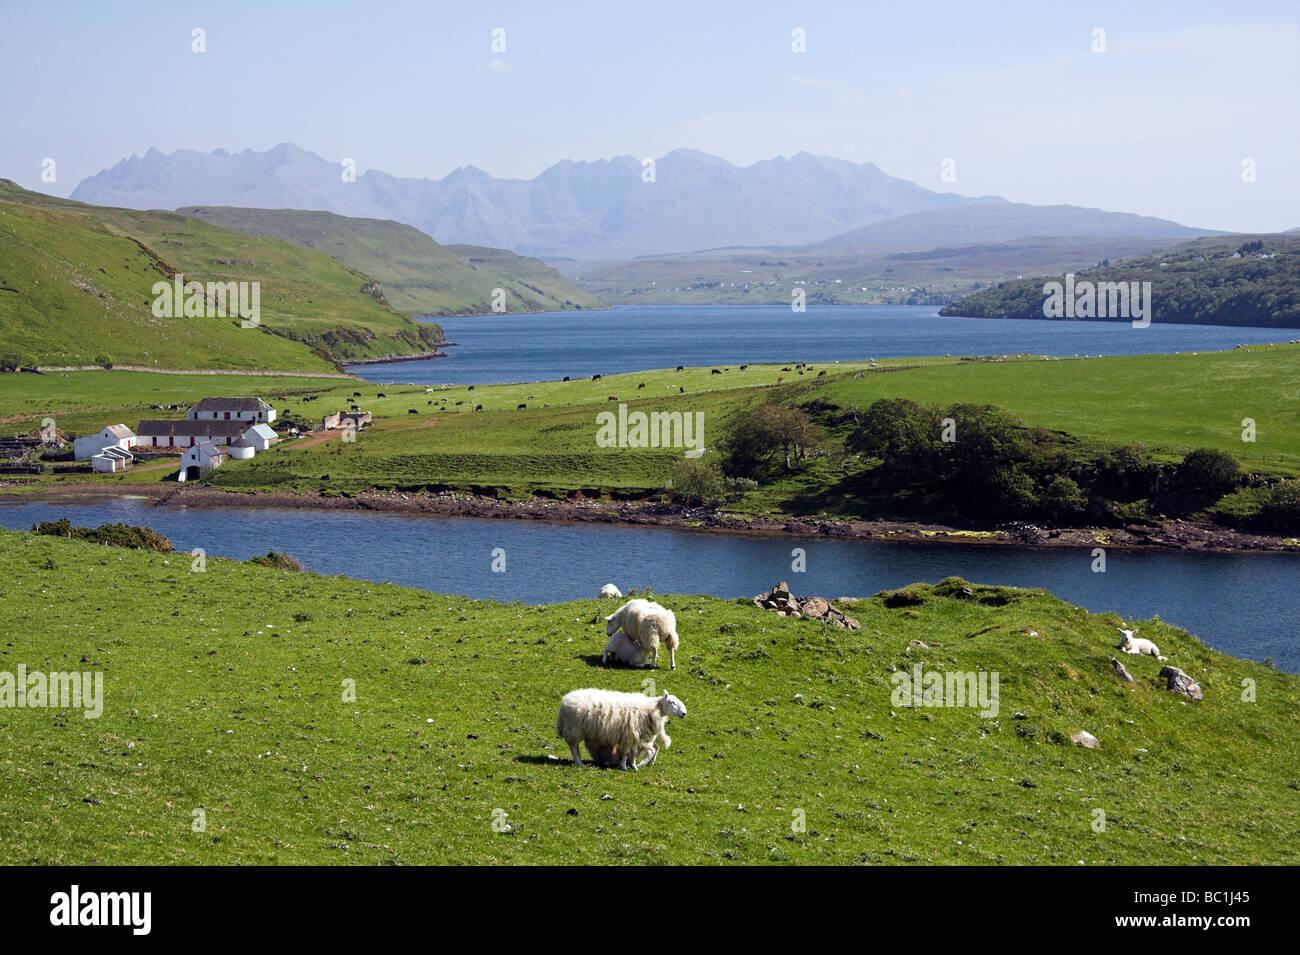 Sheep grazing, Loch Harport,  Cuillin Hills, Isle of Skye, Inner Hebrides, West Coast of Scotland, UK Stock Photo